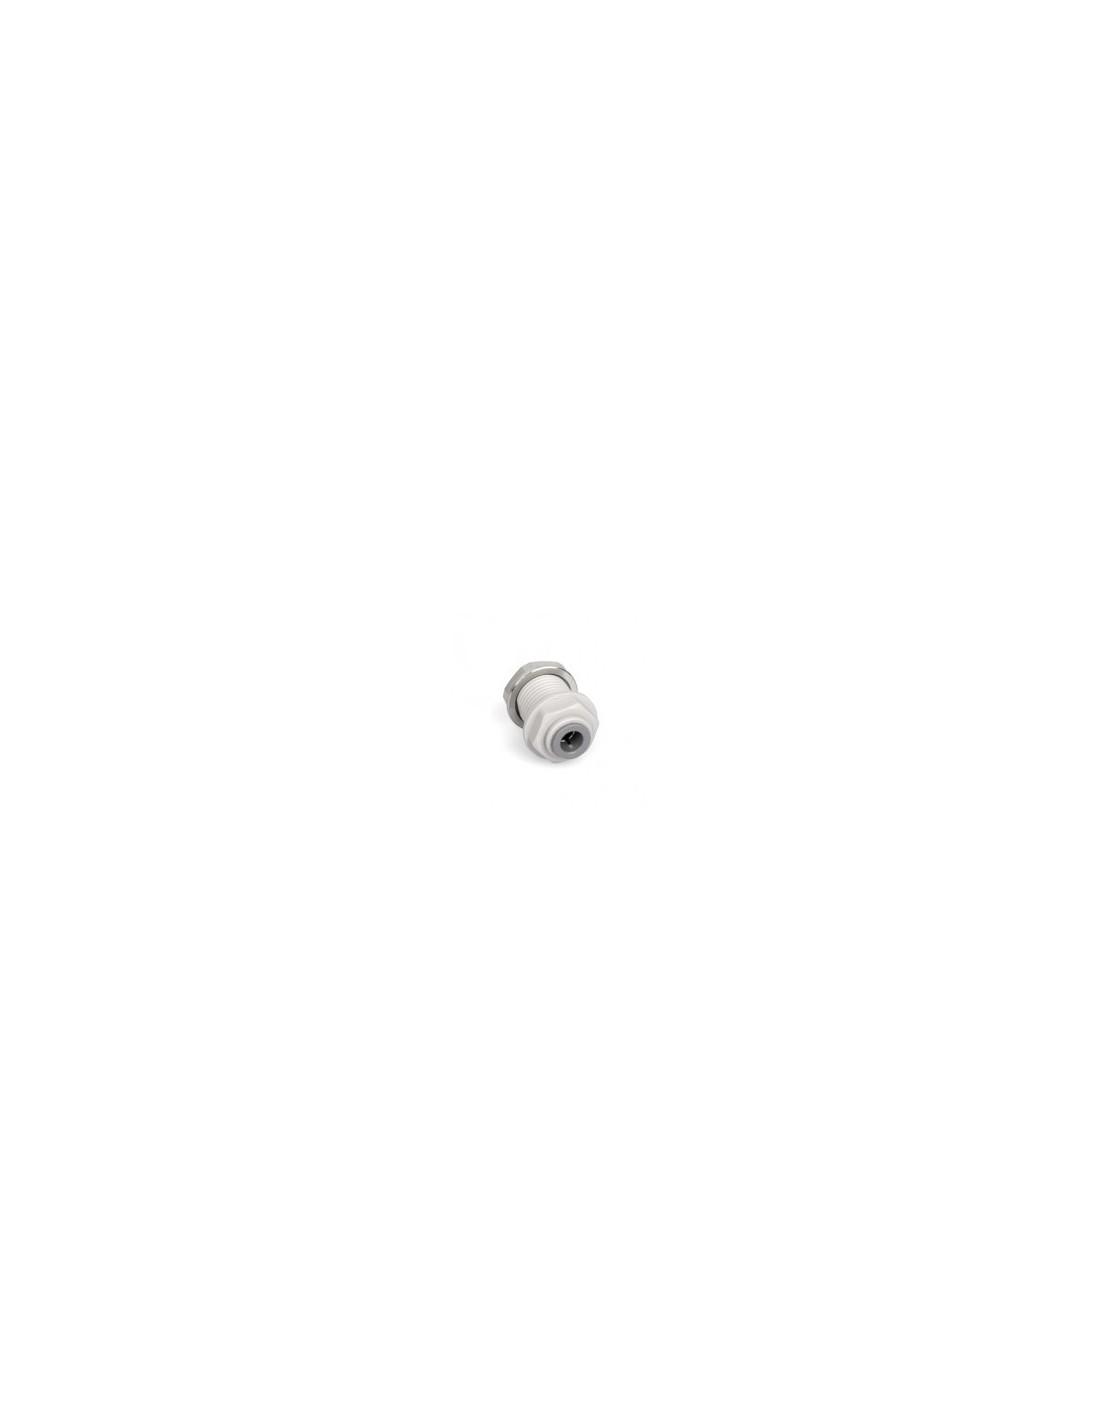 "SPO00423 - JG Bulkhead connector 9.5 x 6mm (3/8"" x 1/4"") (PI121208S)"